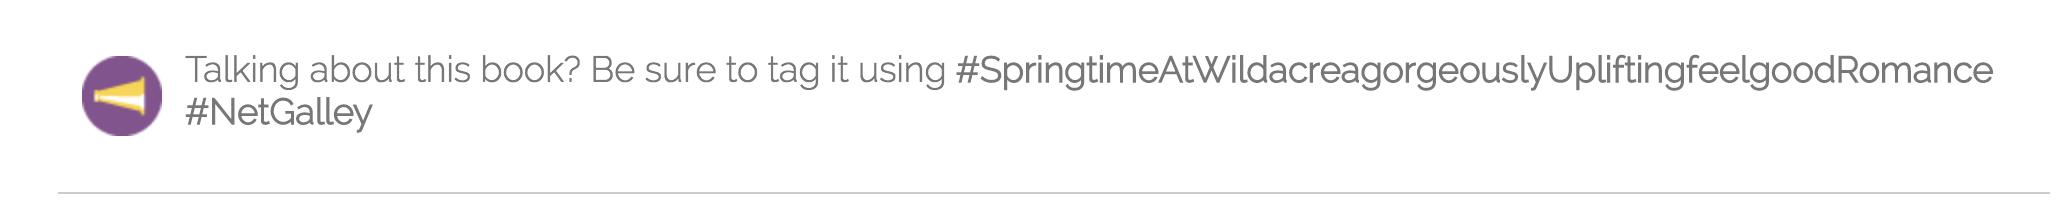 Talking about this book? Be sure to tag it using #SpringtimeAtWildacreagorgeouslyUpliftingfeelgoodRomance #NetGalley